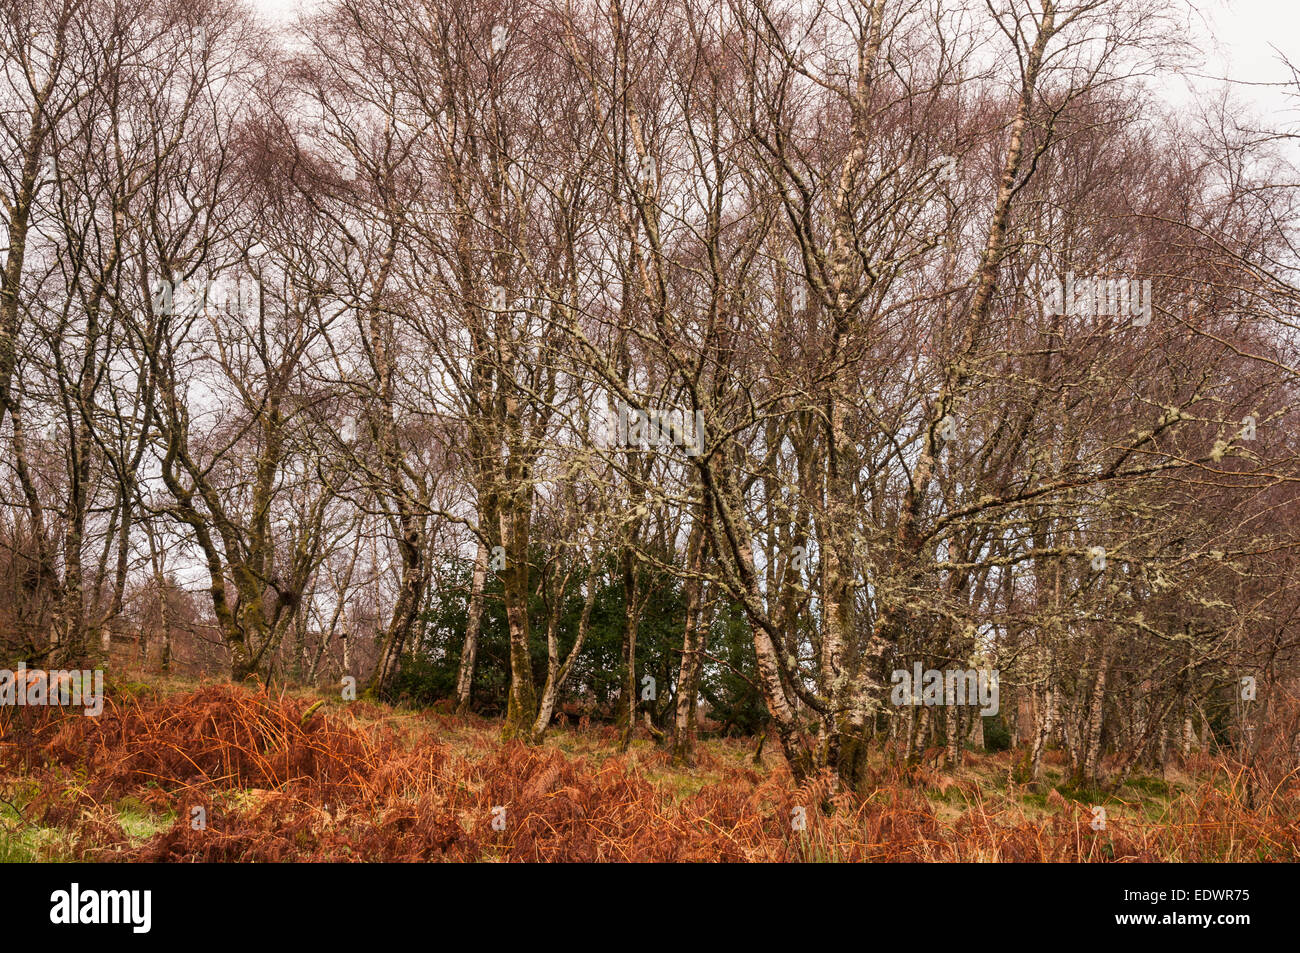 Silver Birch Trees, Betula pendula, in winter amongst the ferns in Scotland - Stock Image